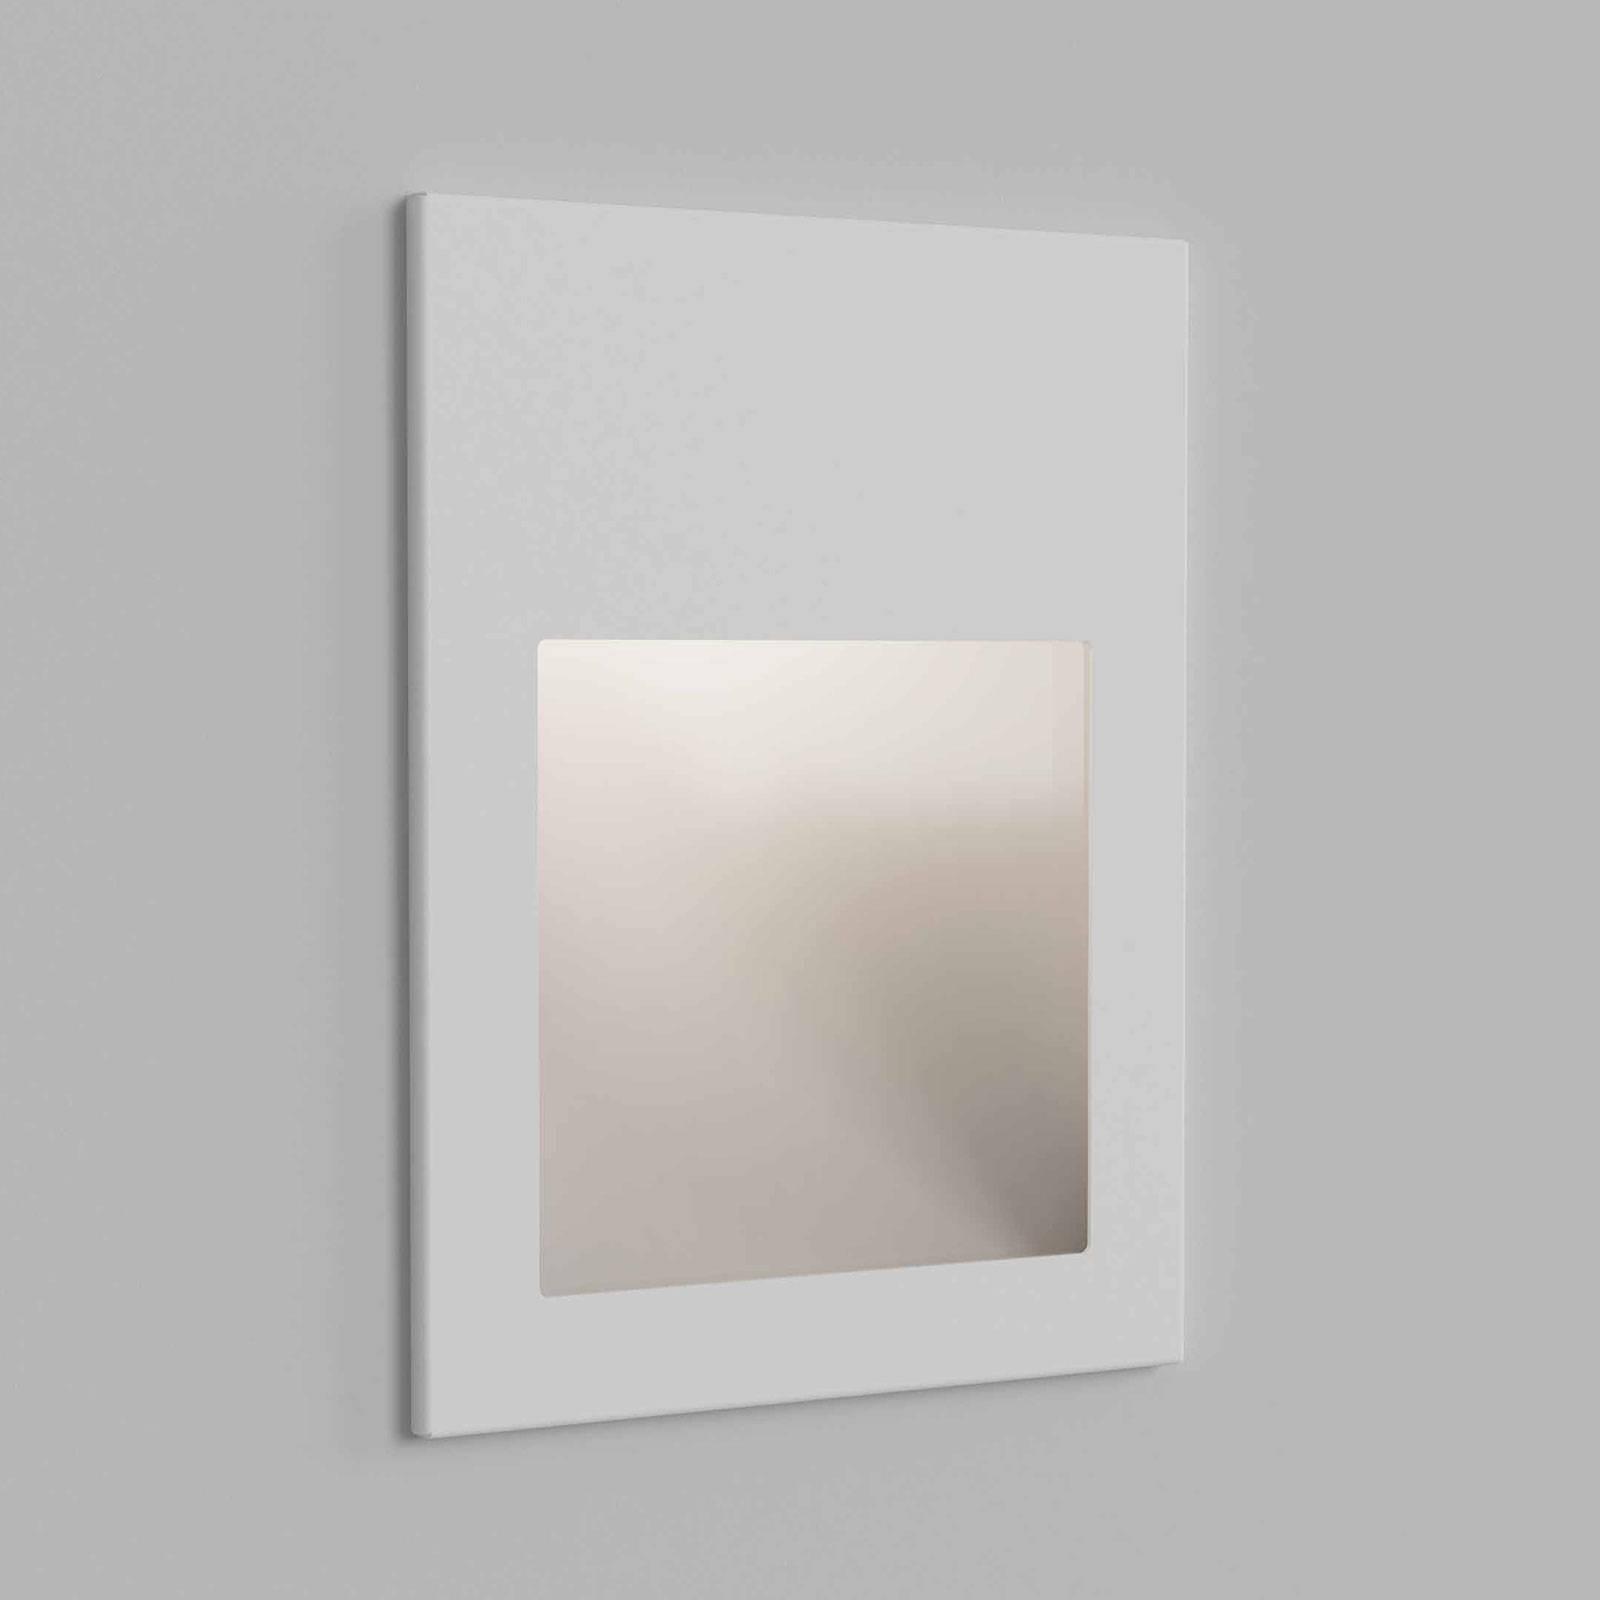 Astro Borgo 90 applique encastr. blanc texturée